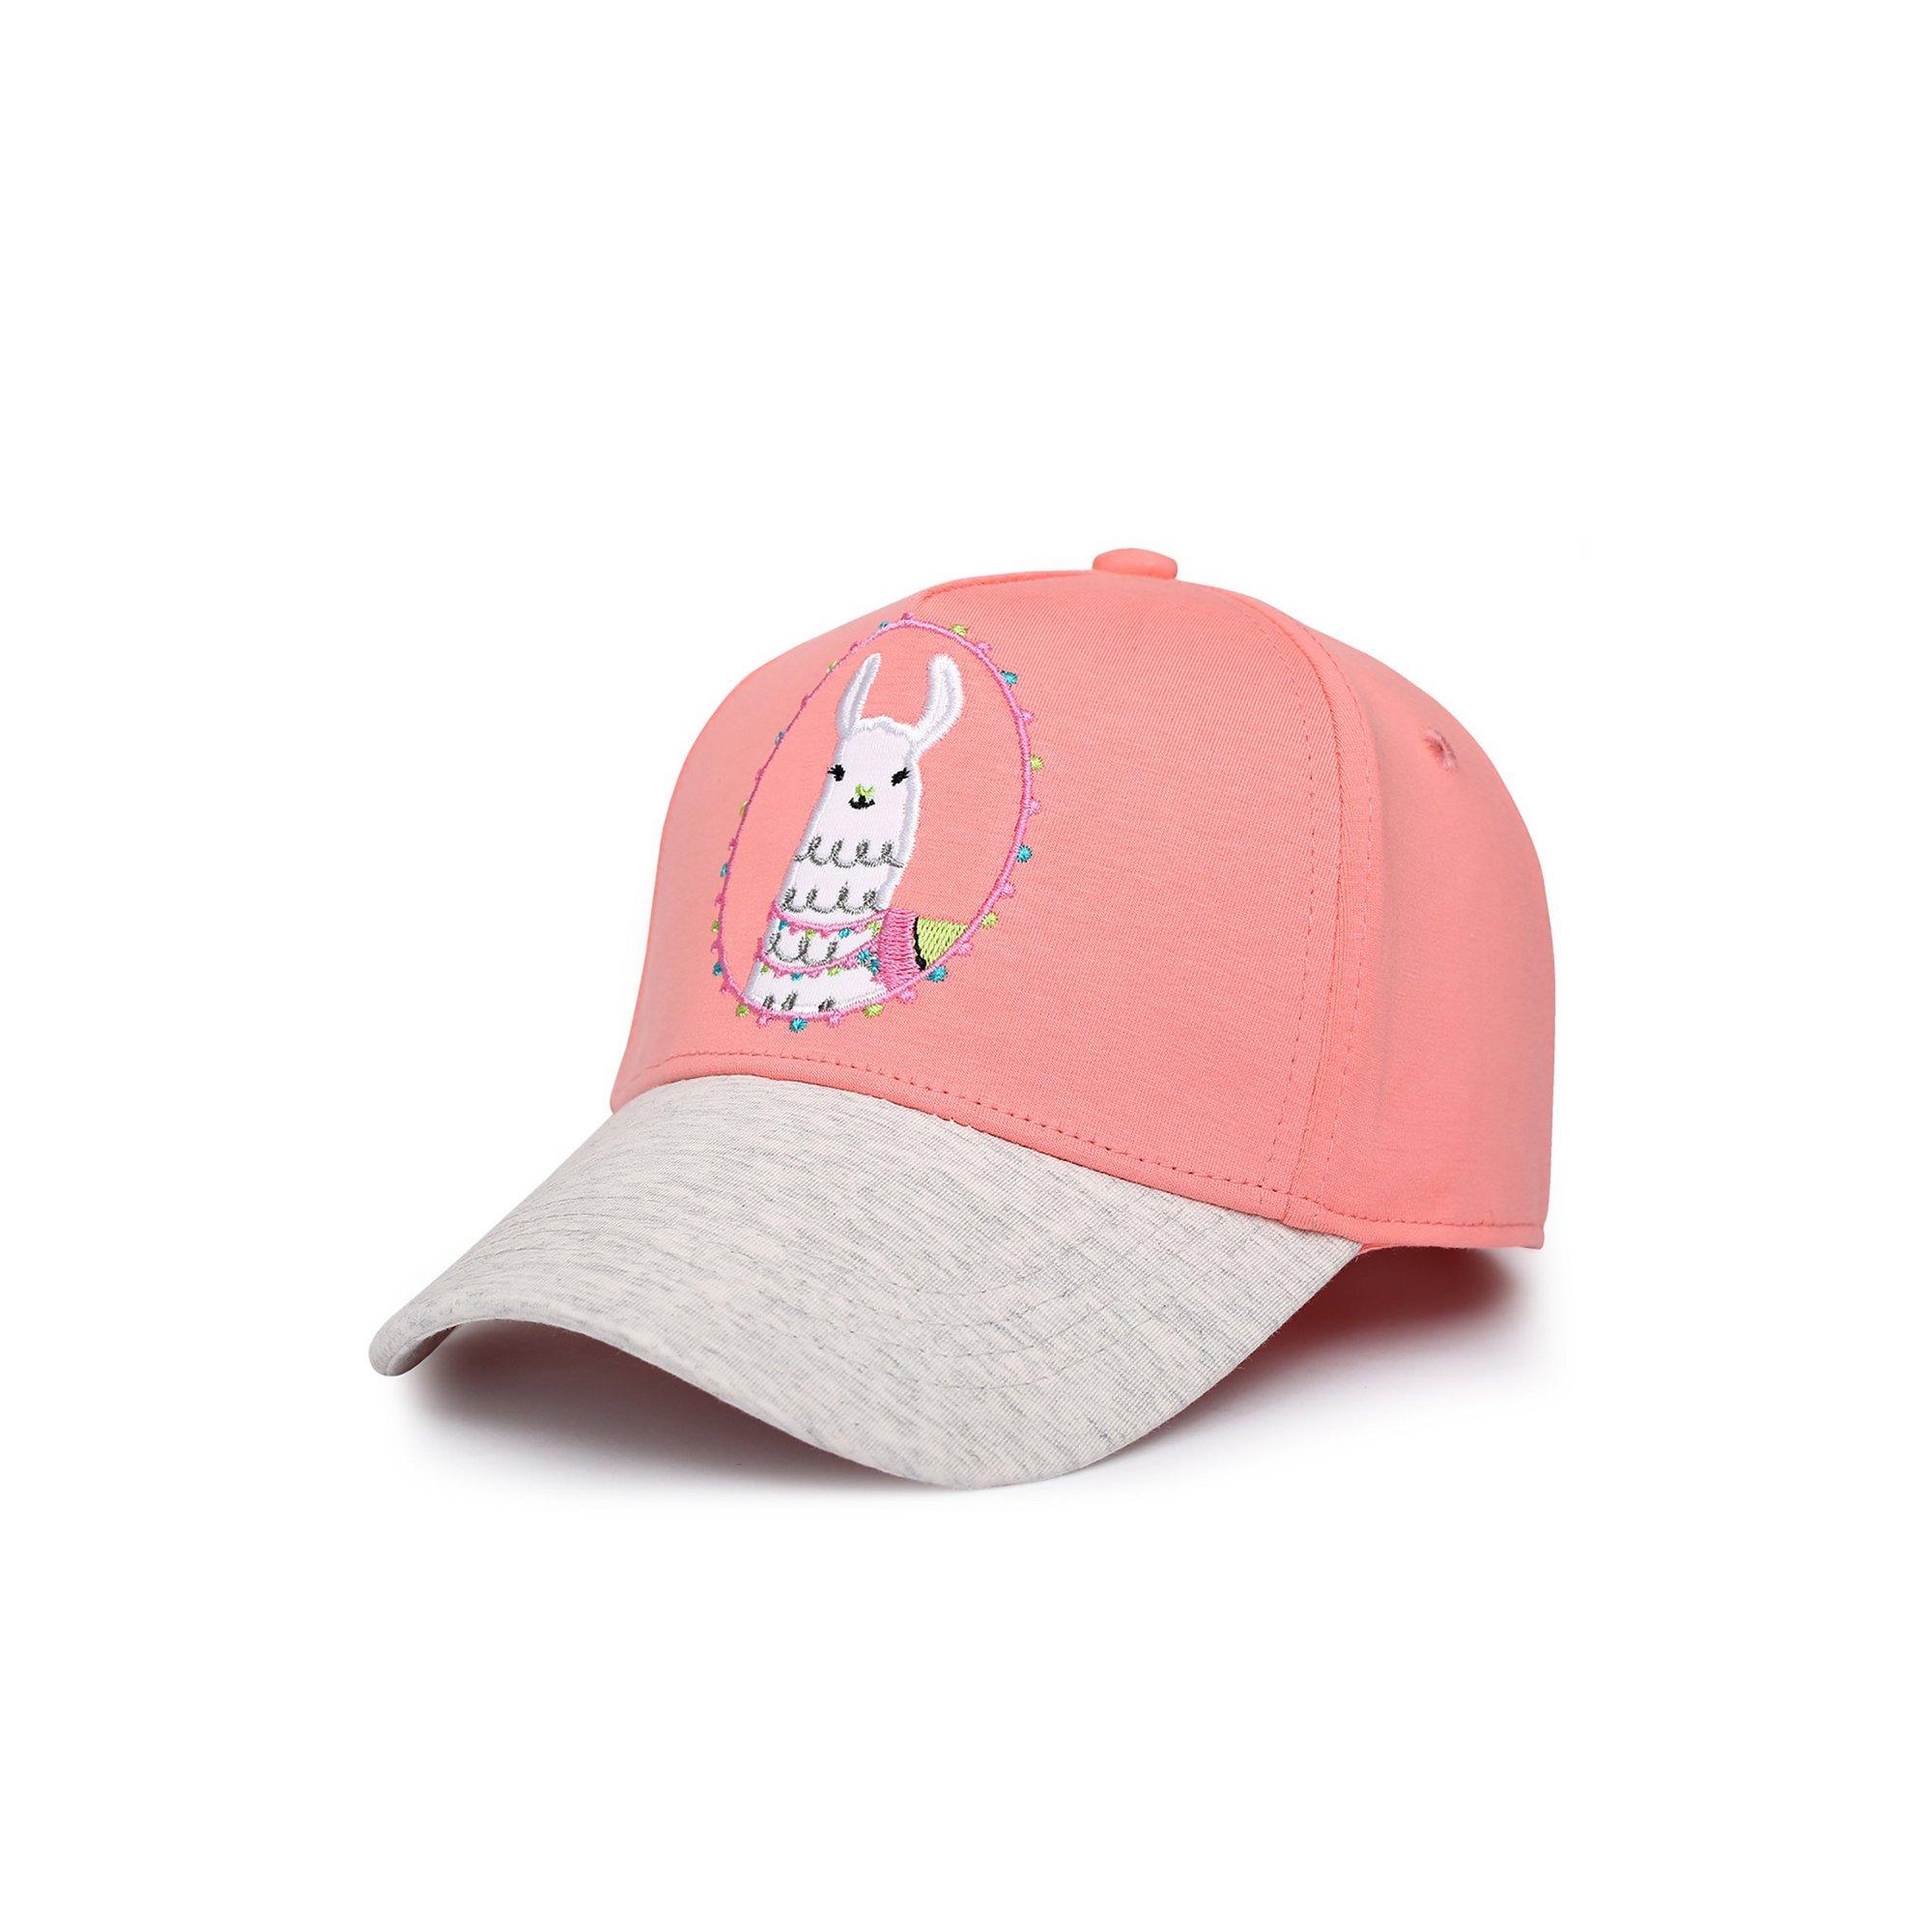 Image of FlapJackKids Ball Cap - Llama